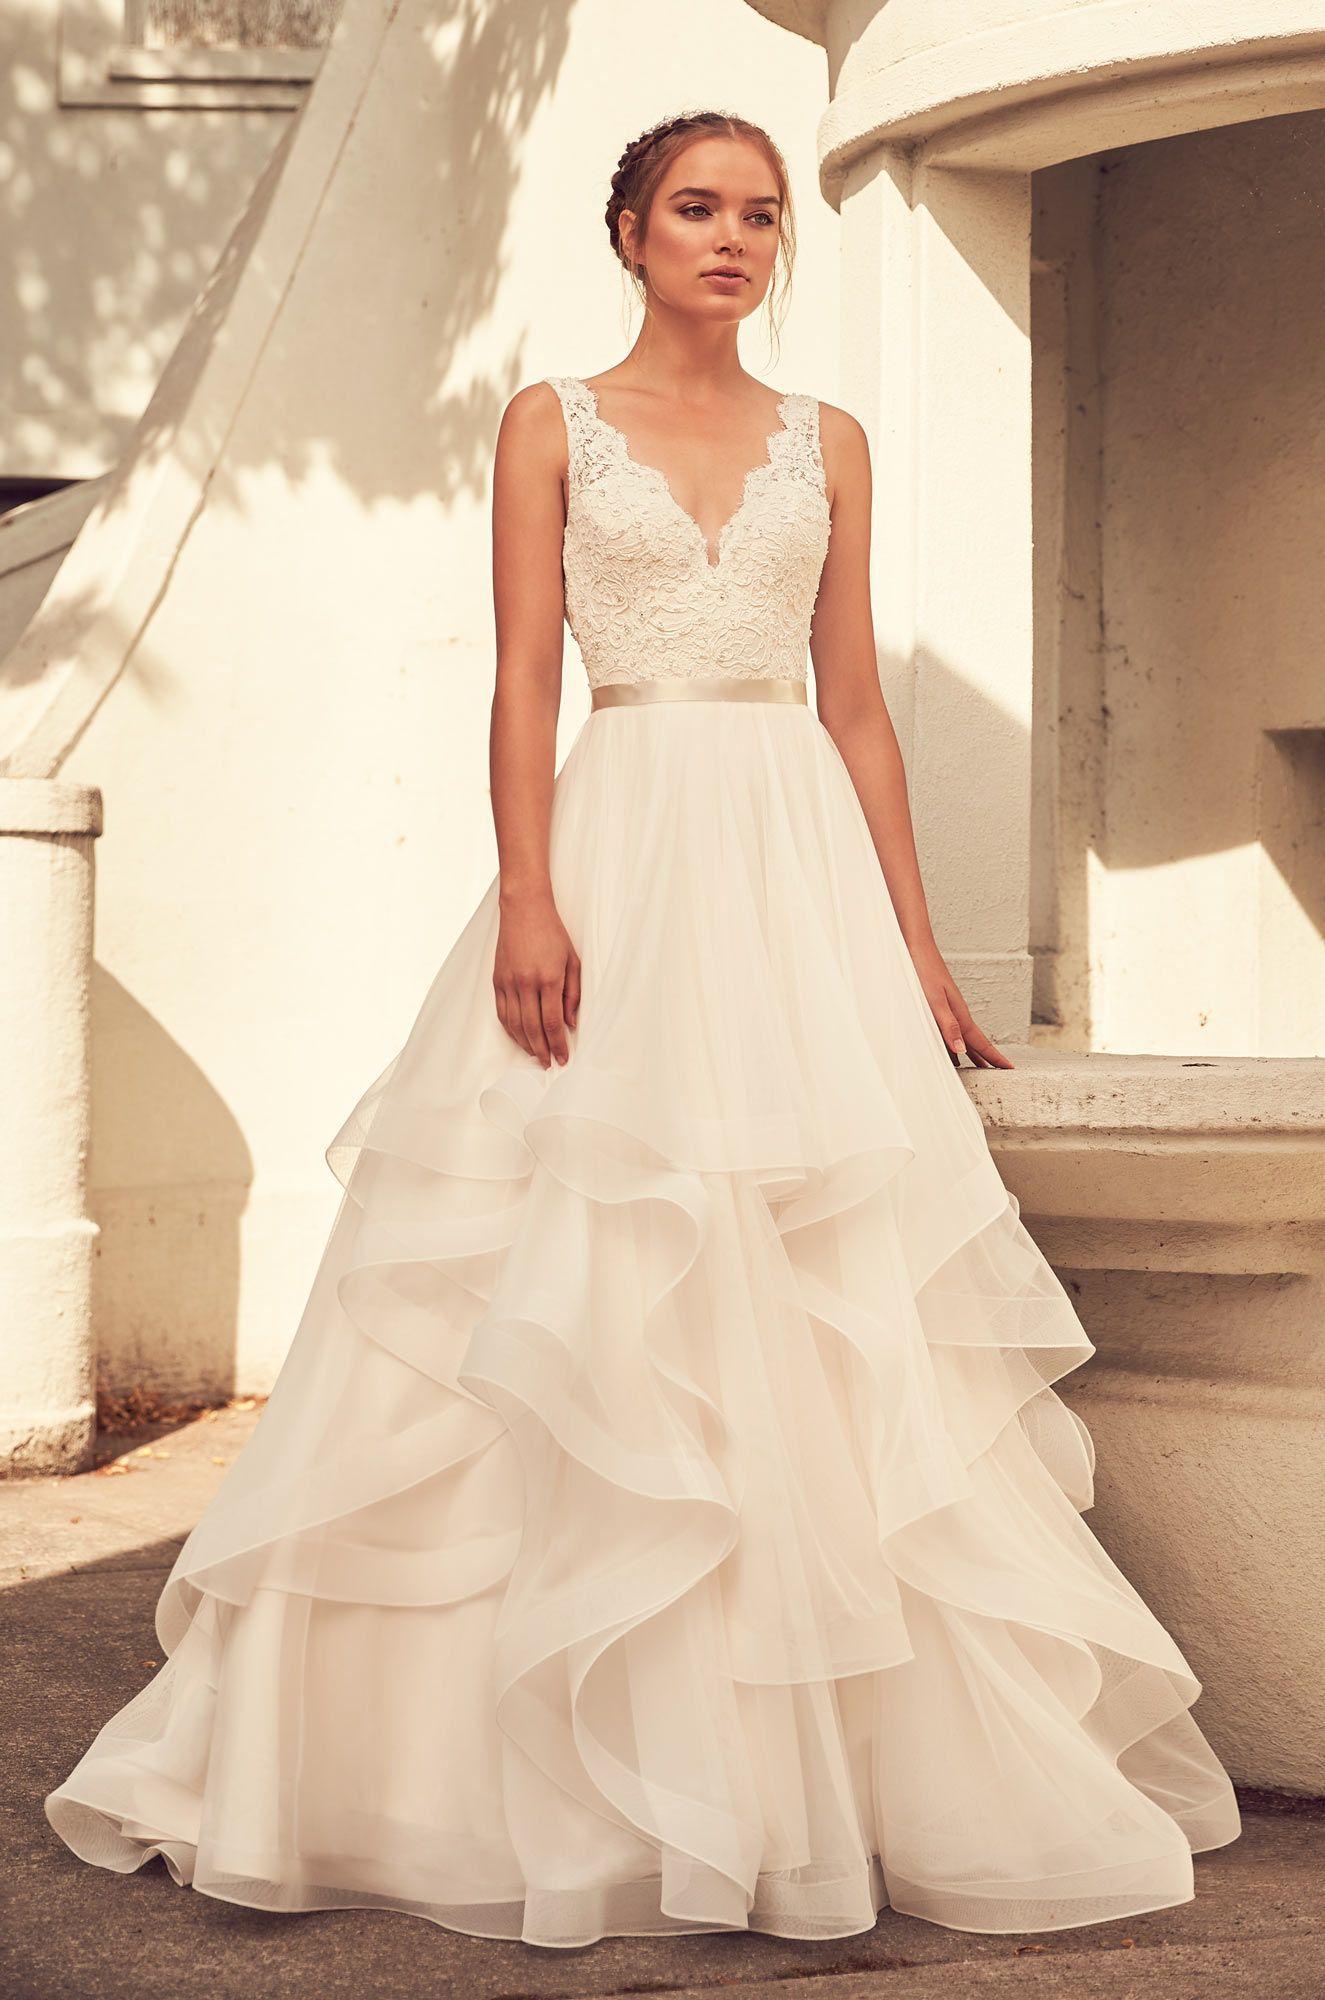 Style french alençon lace and mesh tulle wedding dress